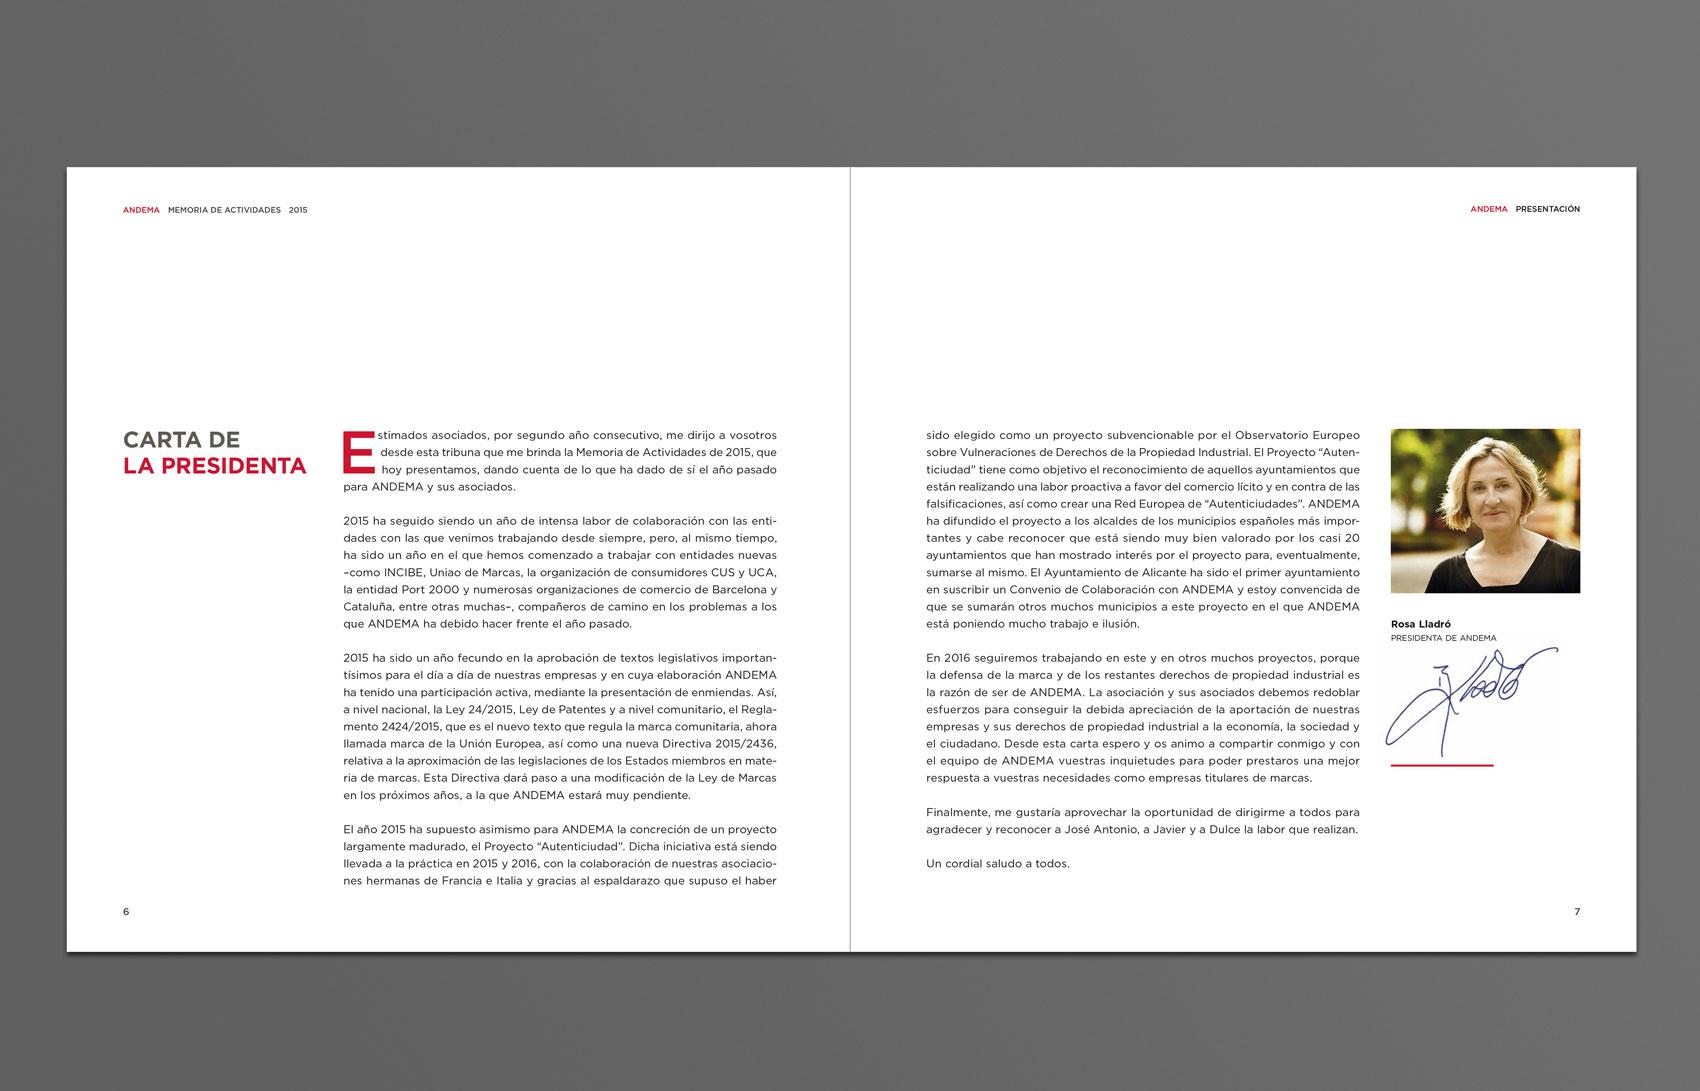 edit-andema-04.jpg